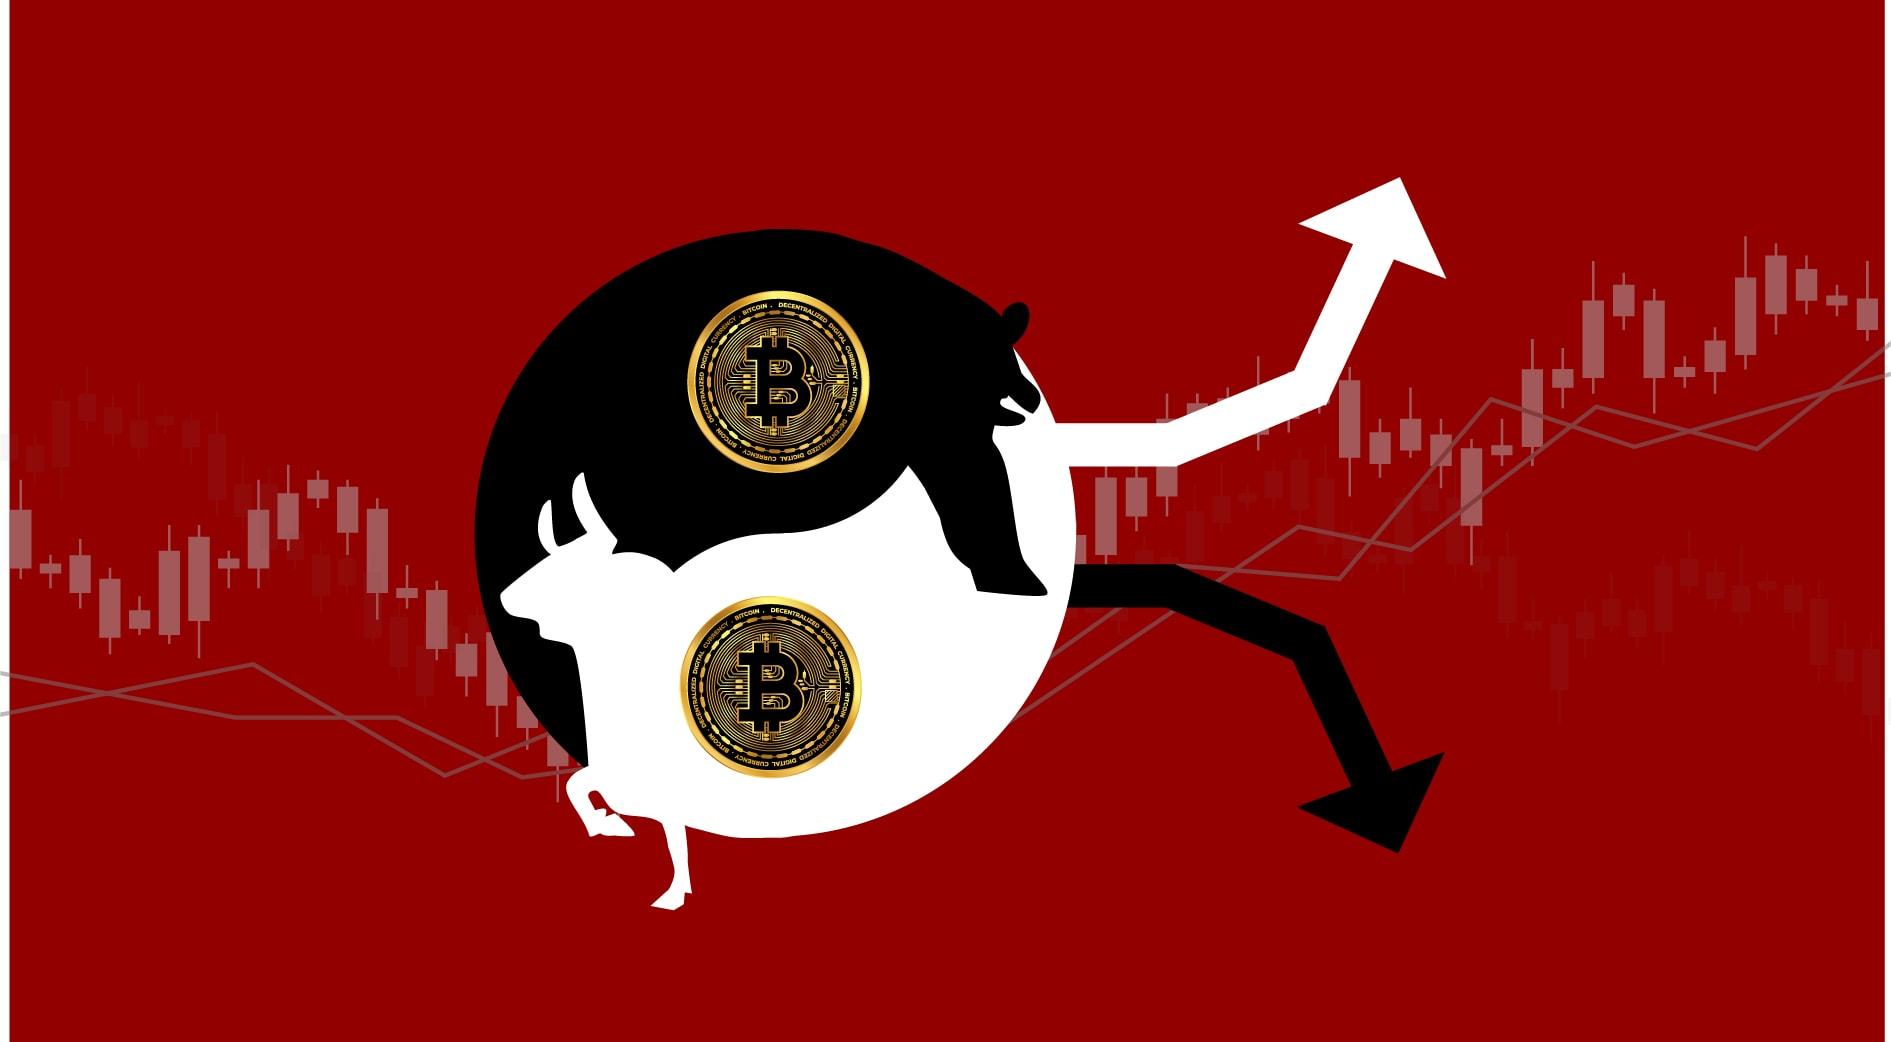 Bitcoin price volatile markets digital cryptocurrency mining